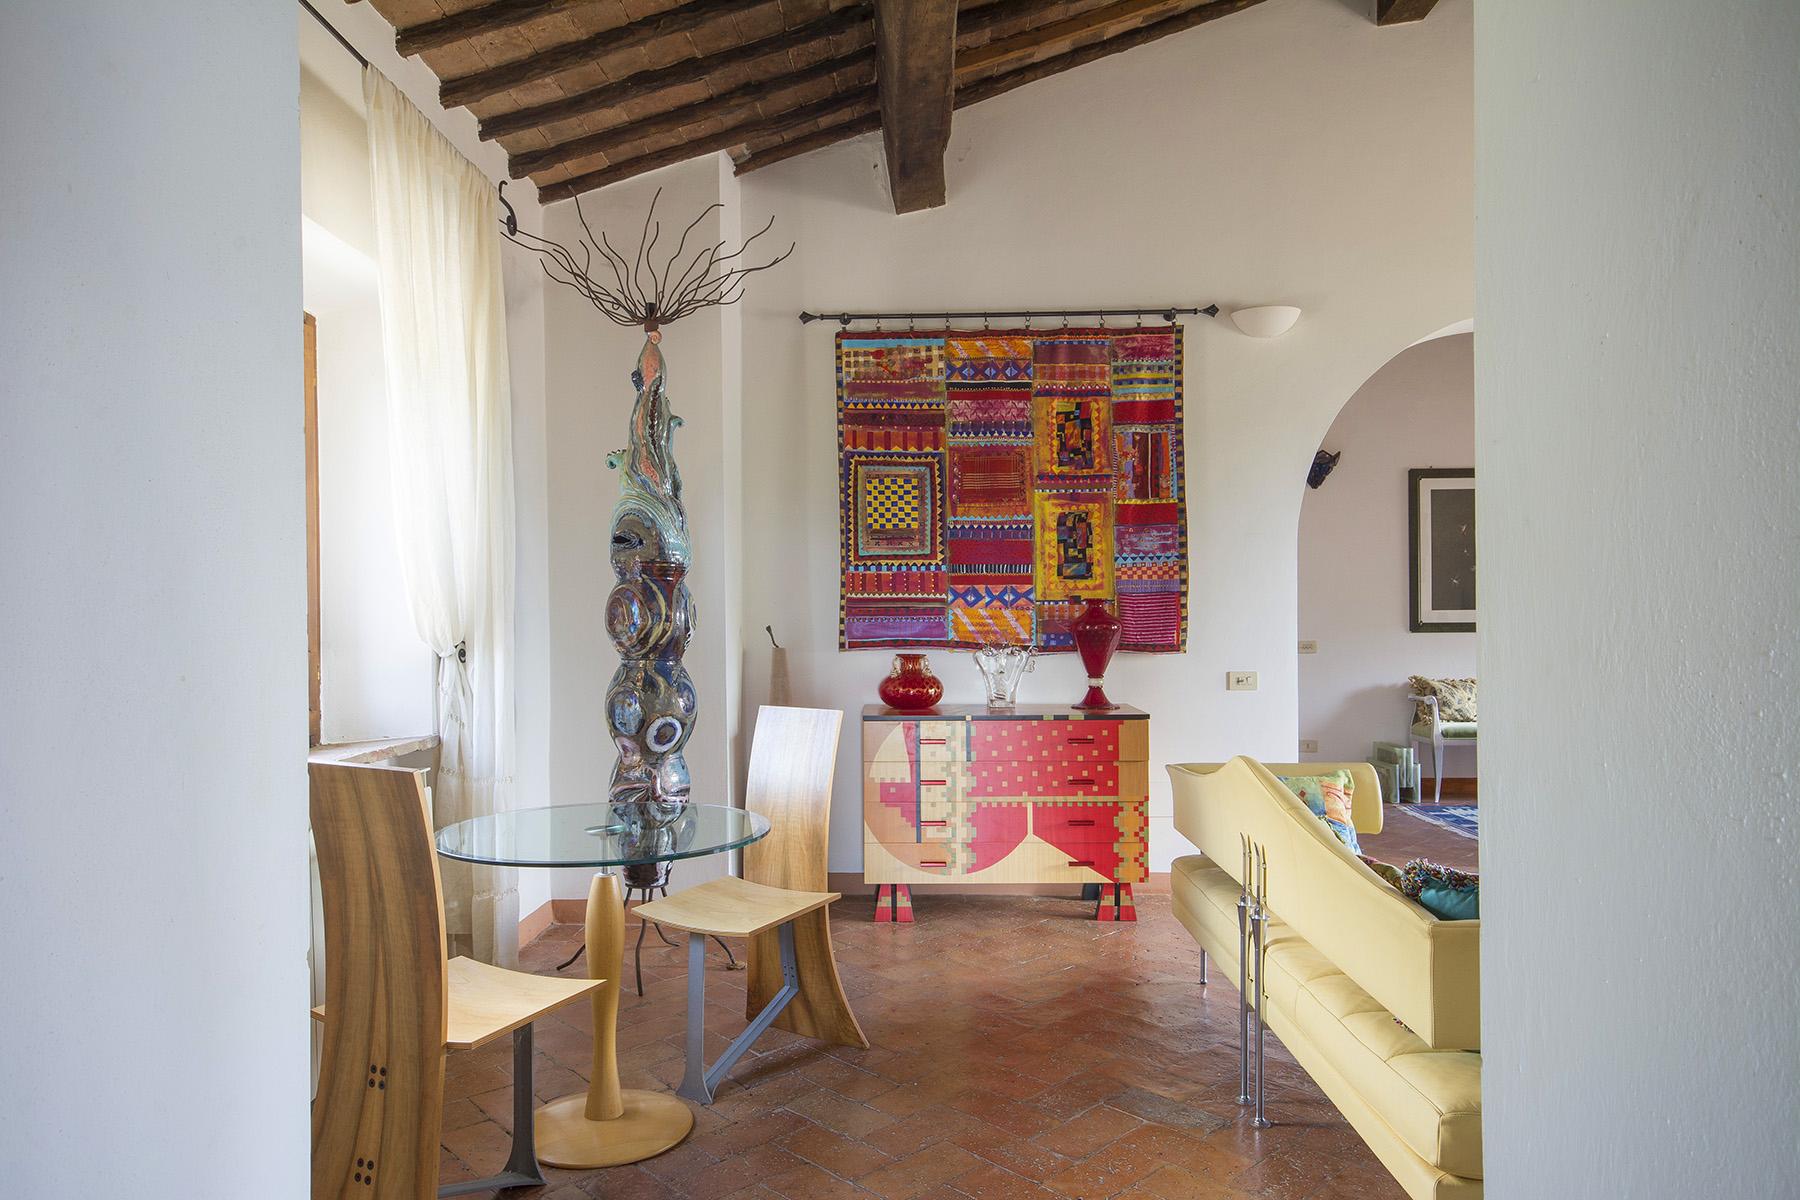 Casa indipendente in Vendita a Pienza: 5 locali, 400 mq - Foto 15